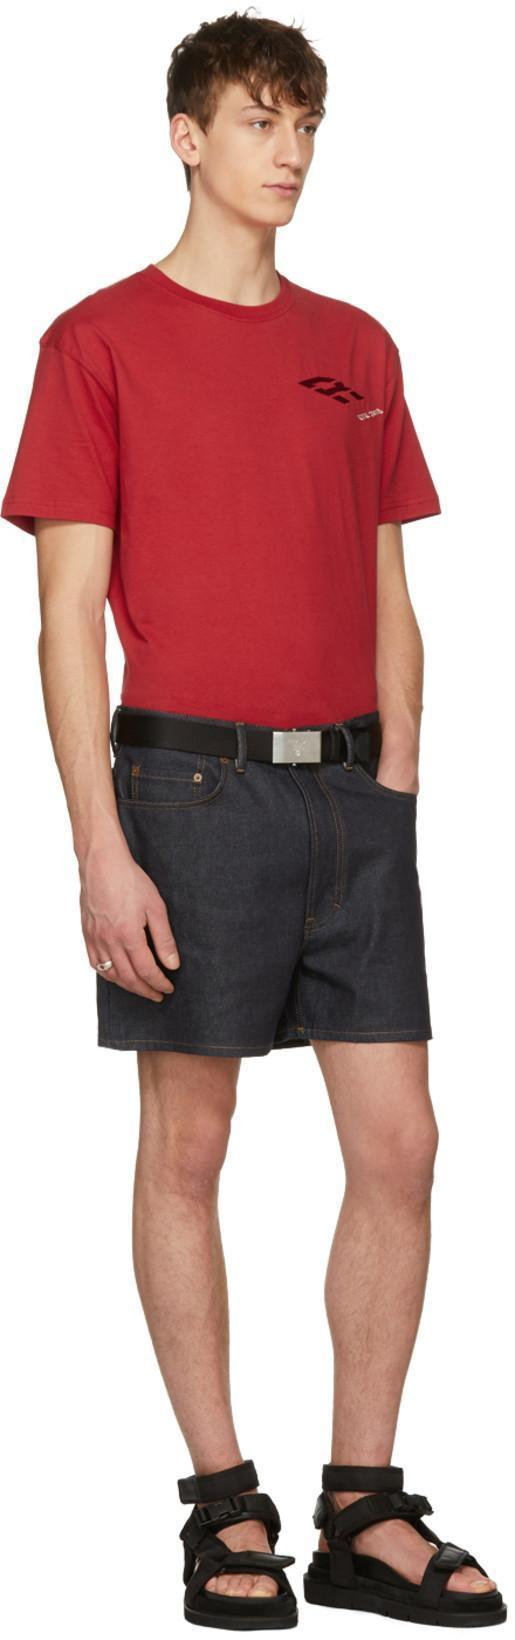 PRADA Reversible Leather Plaque Belt, Black/Blue